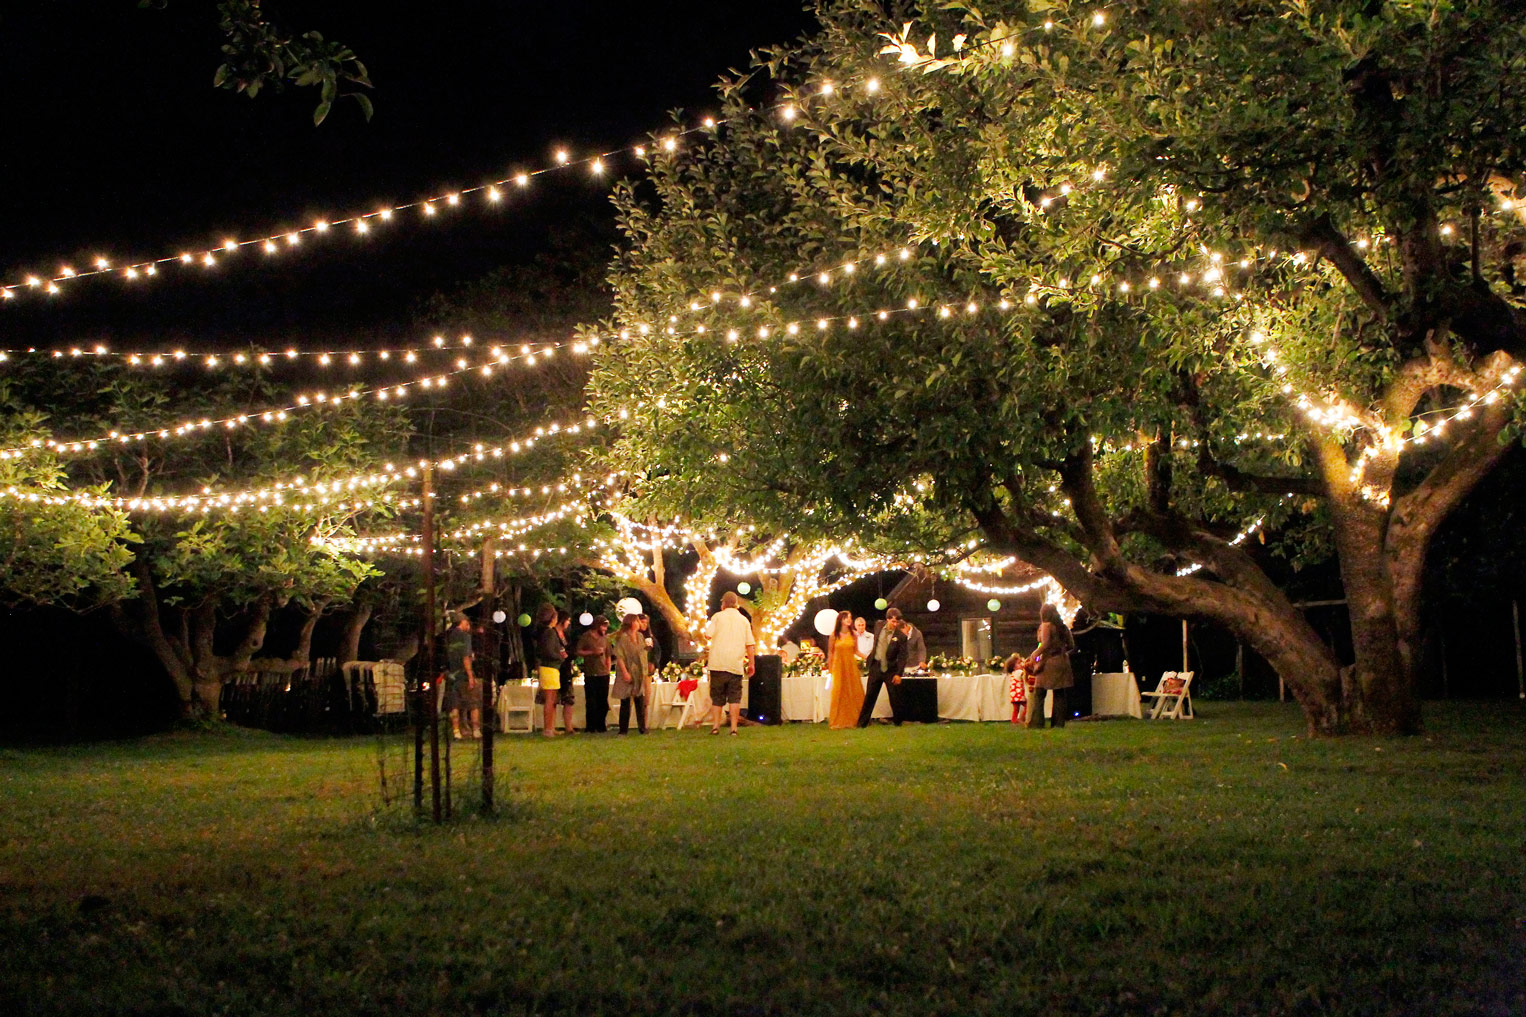 rustic-outdoor-trinity-river-wedding-ruthie-hauge-photography-44.jpg